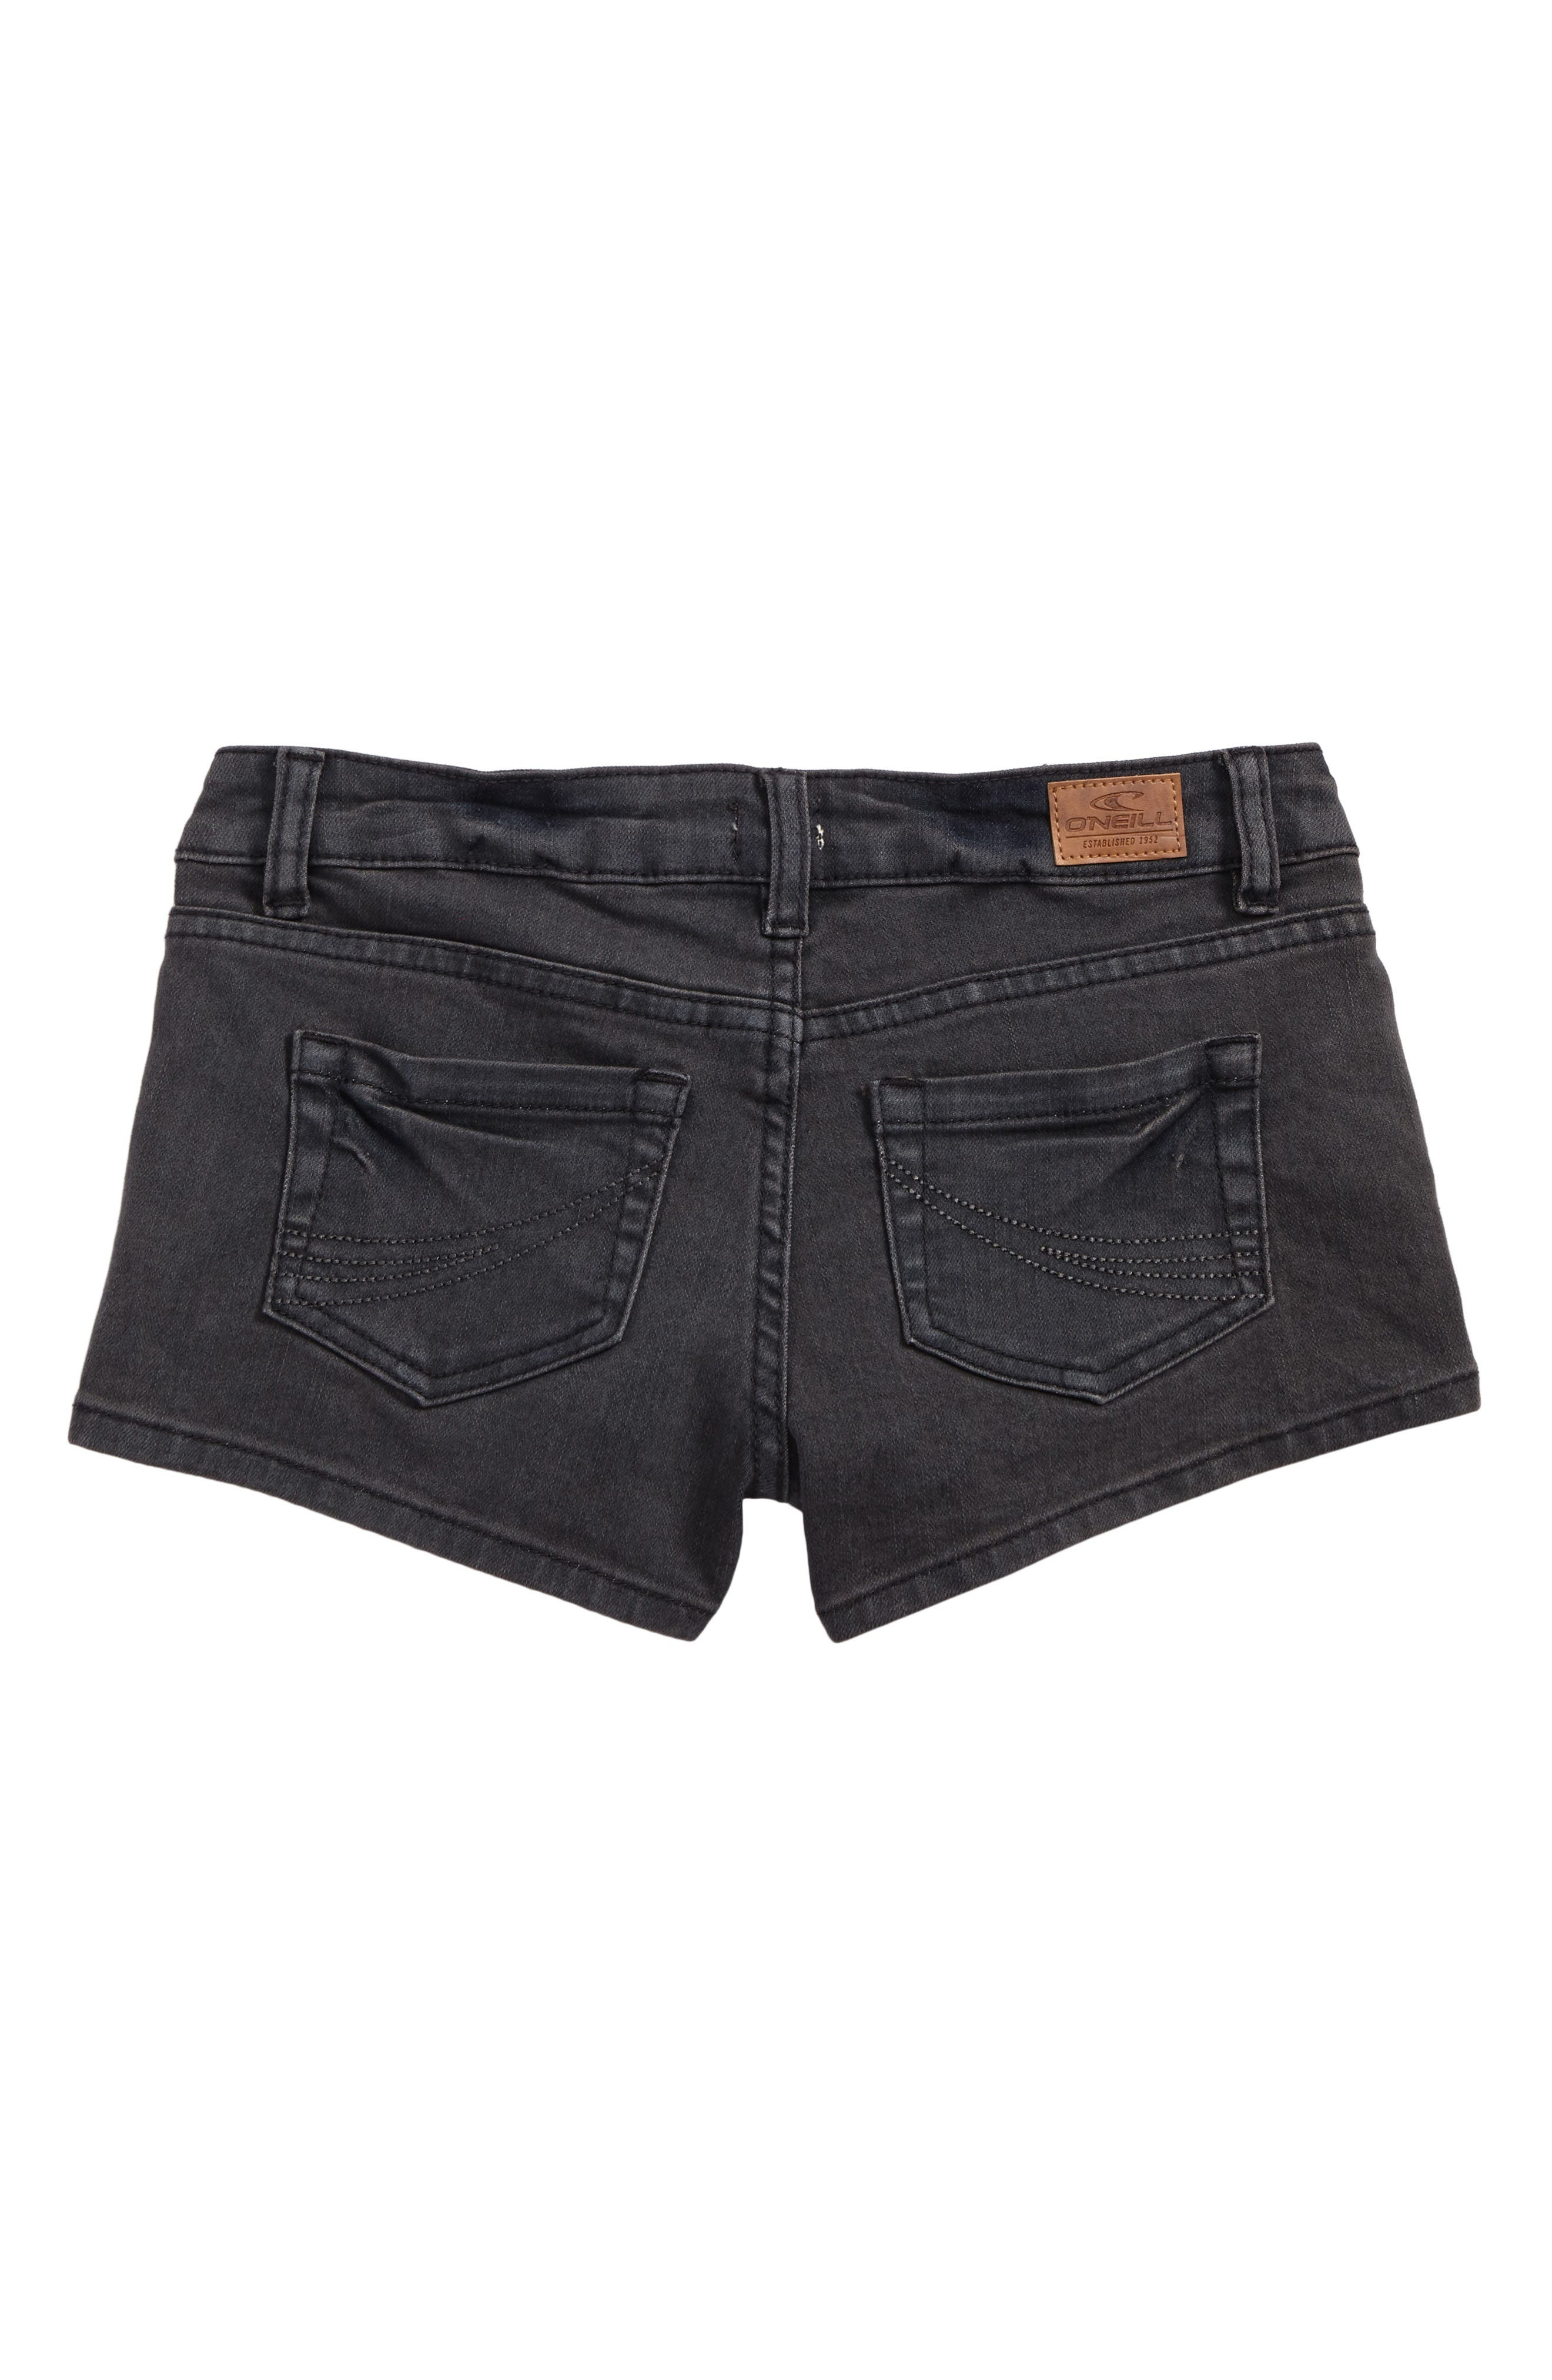 O'Neiil Waidley Denim Shorts,                             Alternate thumbnail 2, color,                             SLATE WASH - SLT